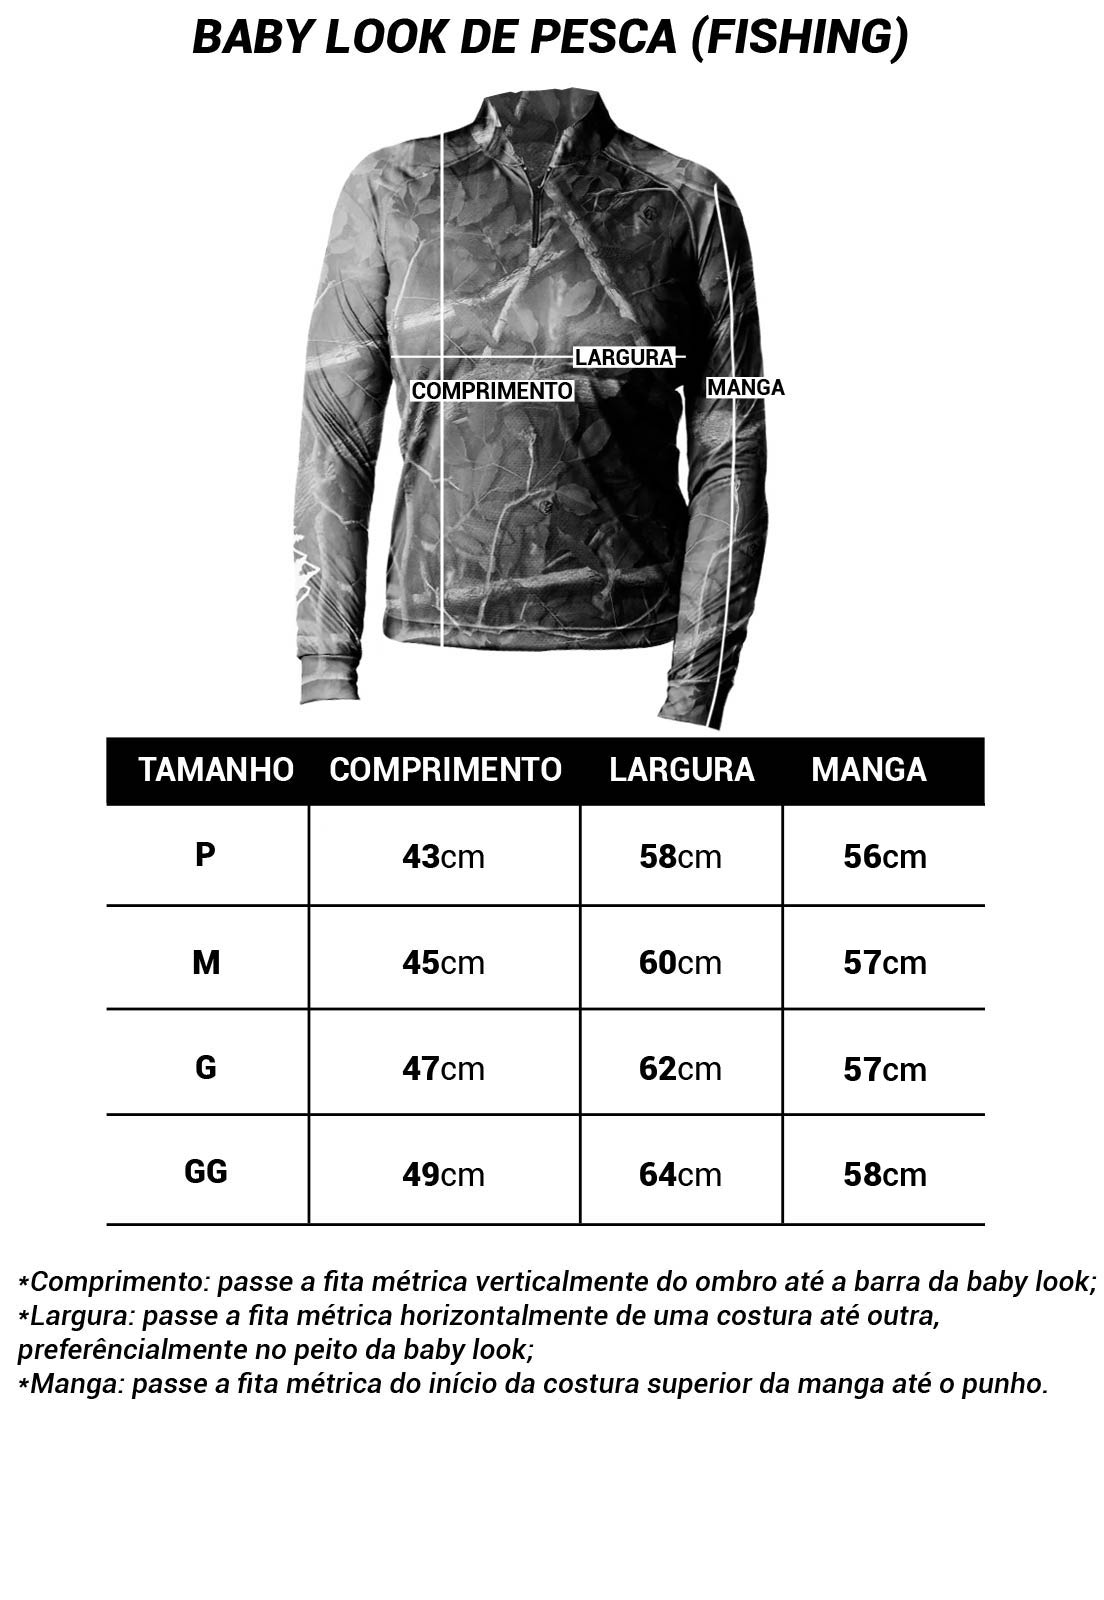 CAMISA DE PESCA FISH TECH PRO 33 FEMININA + BANDANA GRÁTIS  - REAL HUNTER OUTDOORS